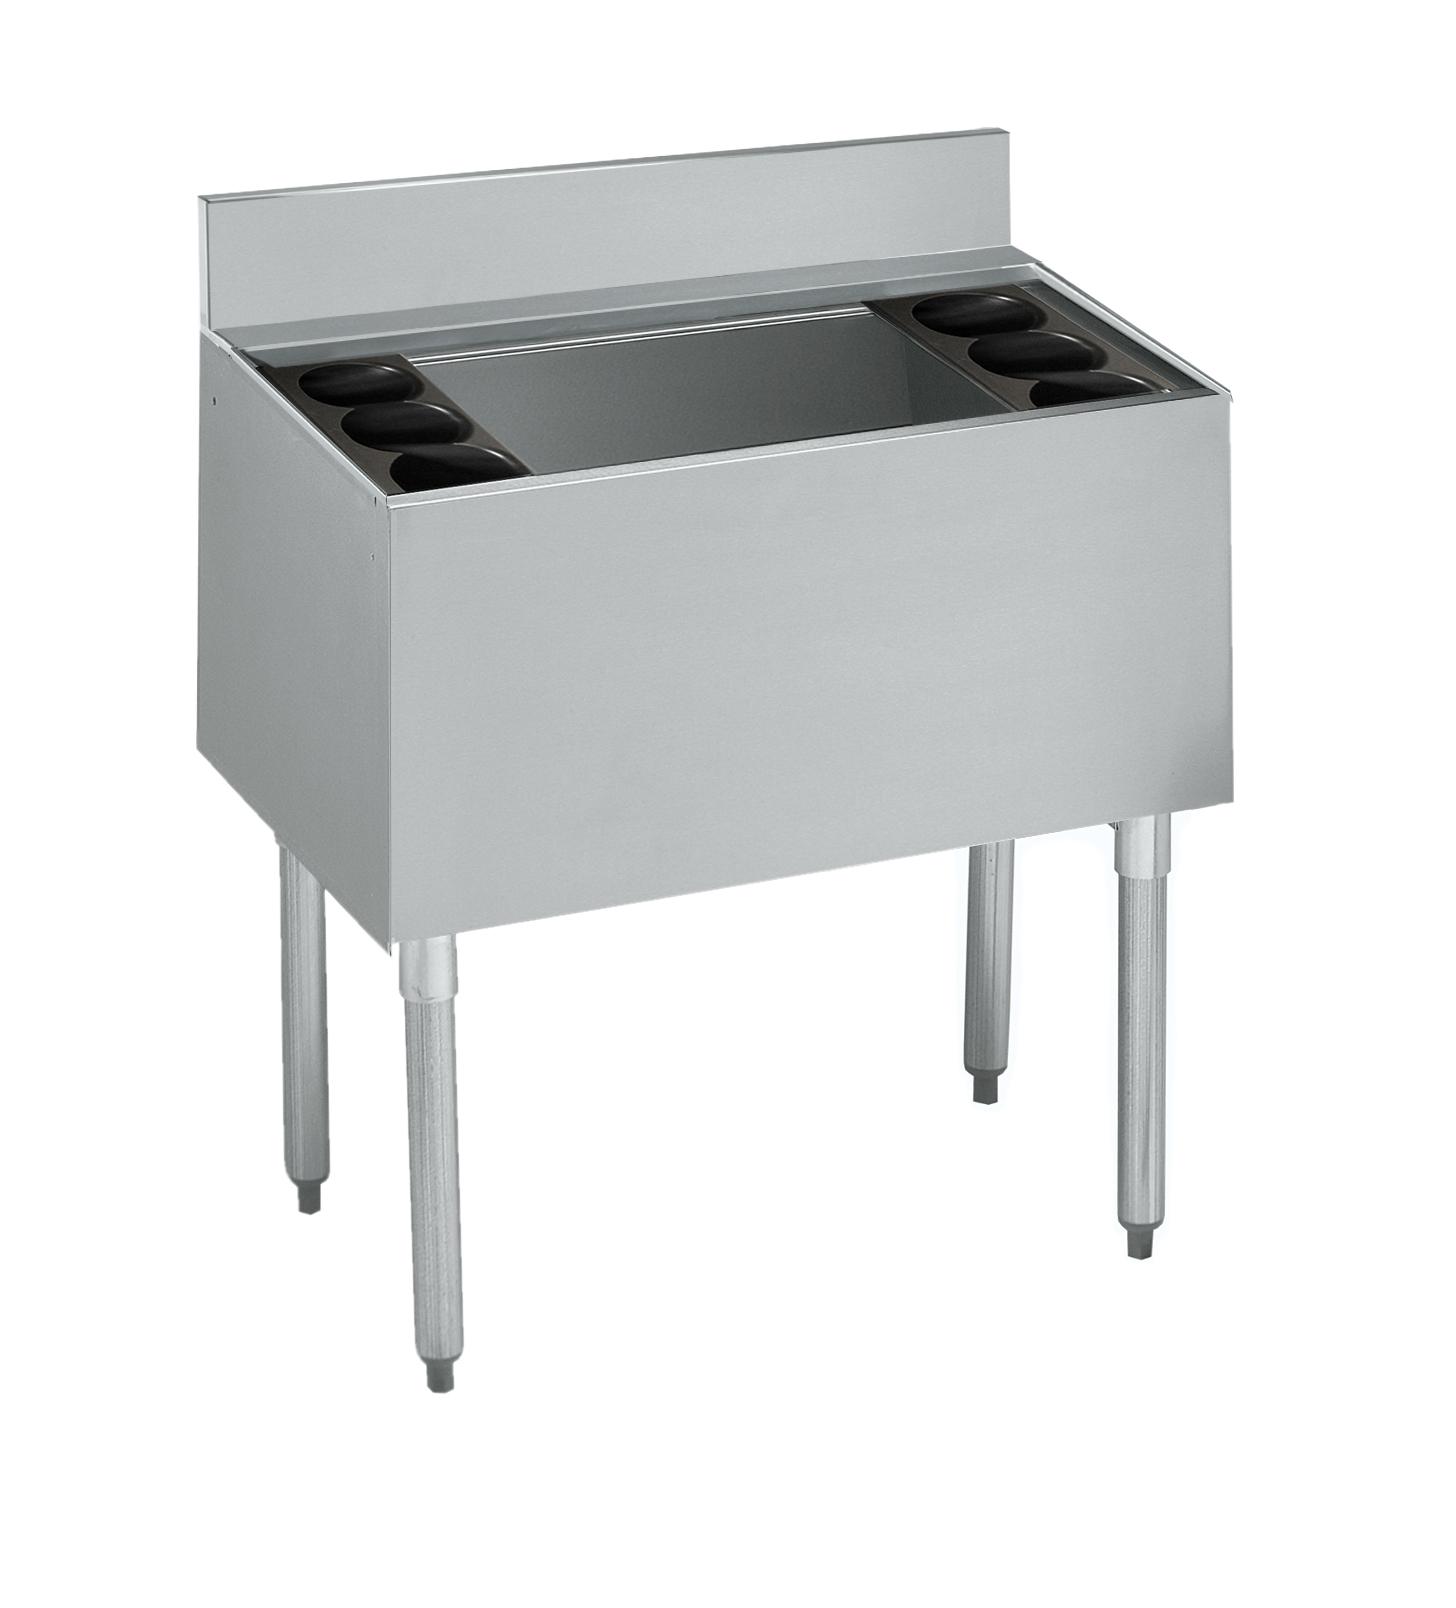 Krowne Metal 21-30DP-7 underbar ice bin/cocktail unit